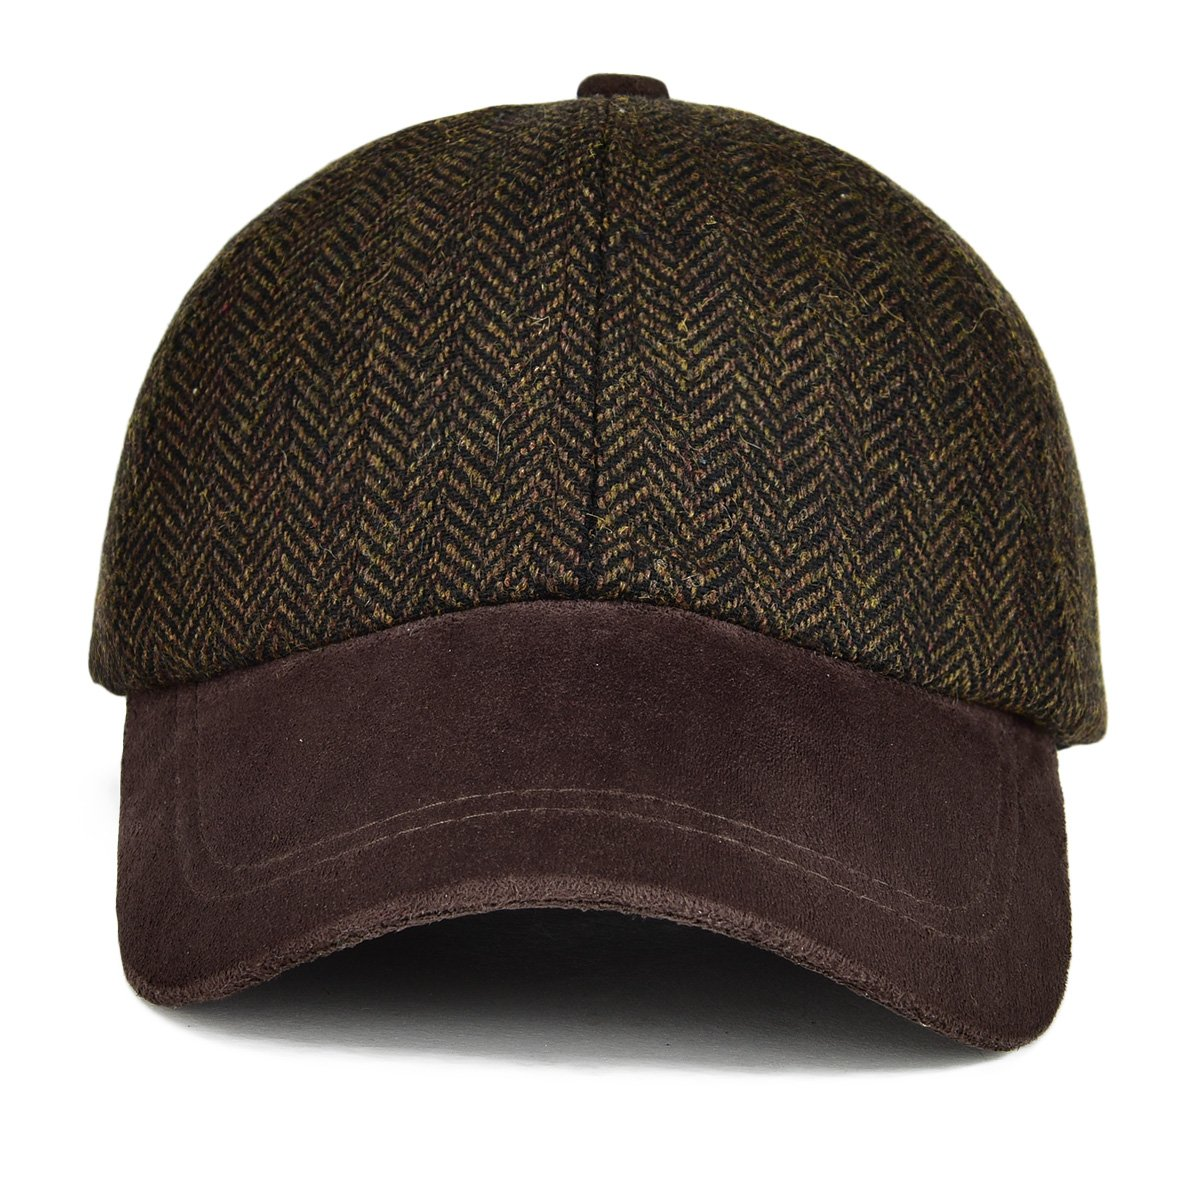 55e0bef3 VOBOOM Men's Wool Blend Baseball Cap Herringbone Tweed Ball Cap Check  Woolen Adjustable Peaked Cap (Coffee) at Amazon Men's Clothing store: